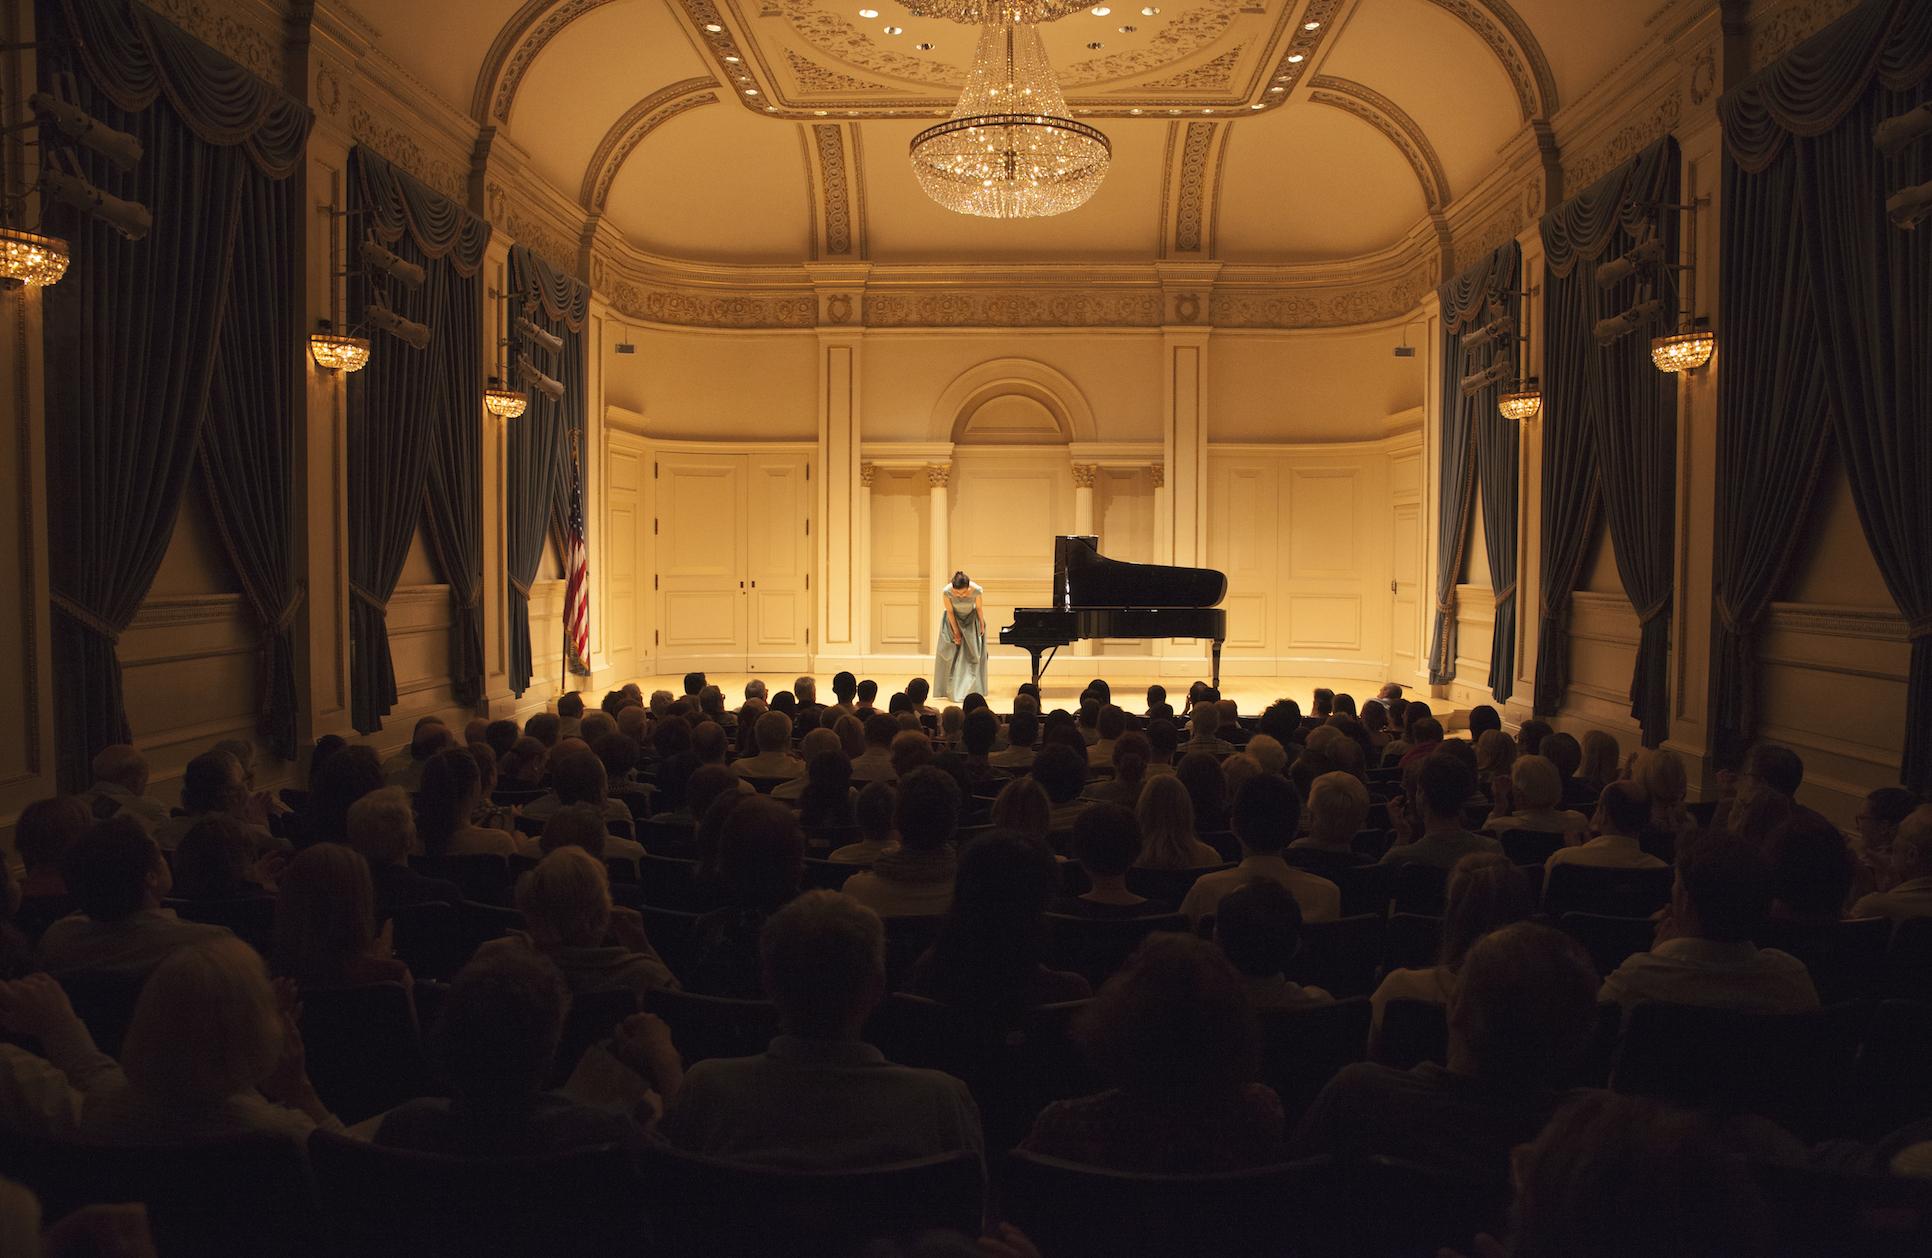 Carnegie Hall copy 2.jpg